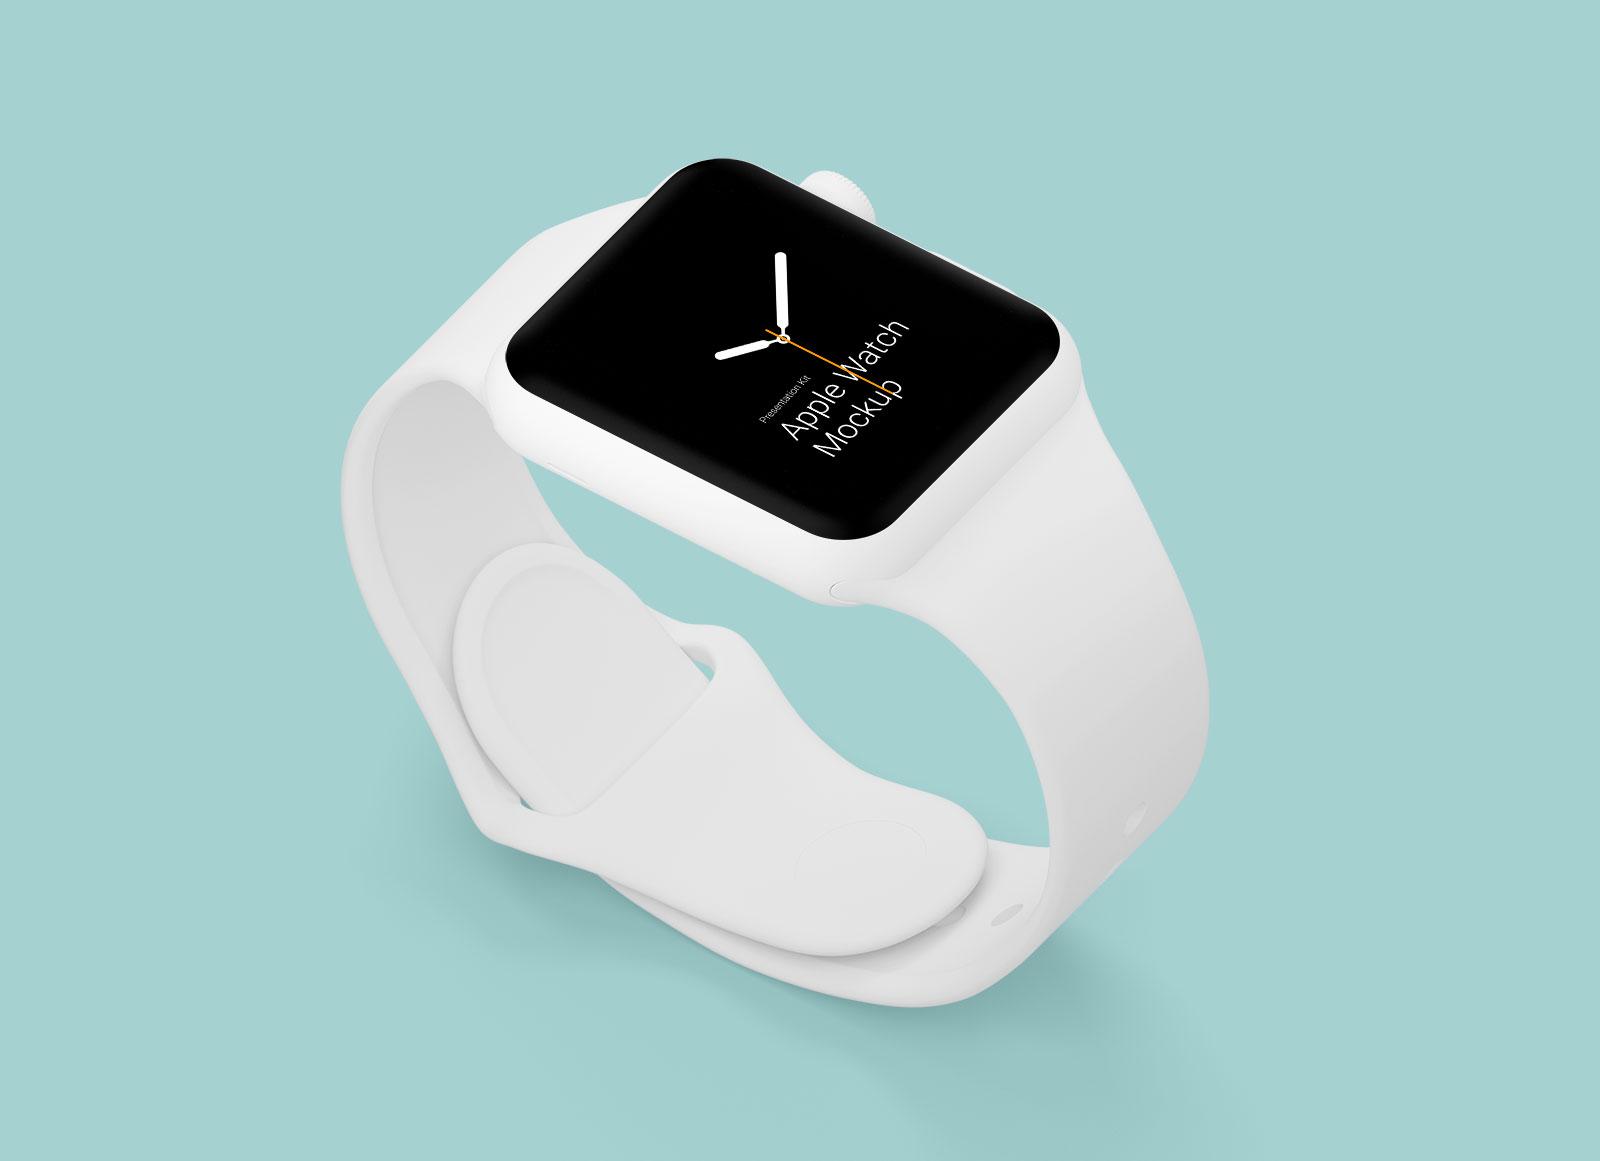 Free-White-Apple-Watch-Mockup-in-PSD-&-Sketch